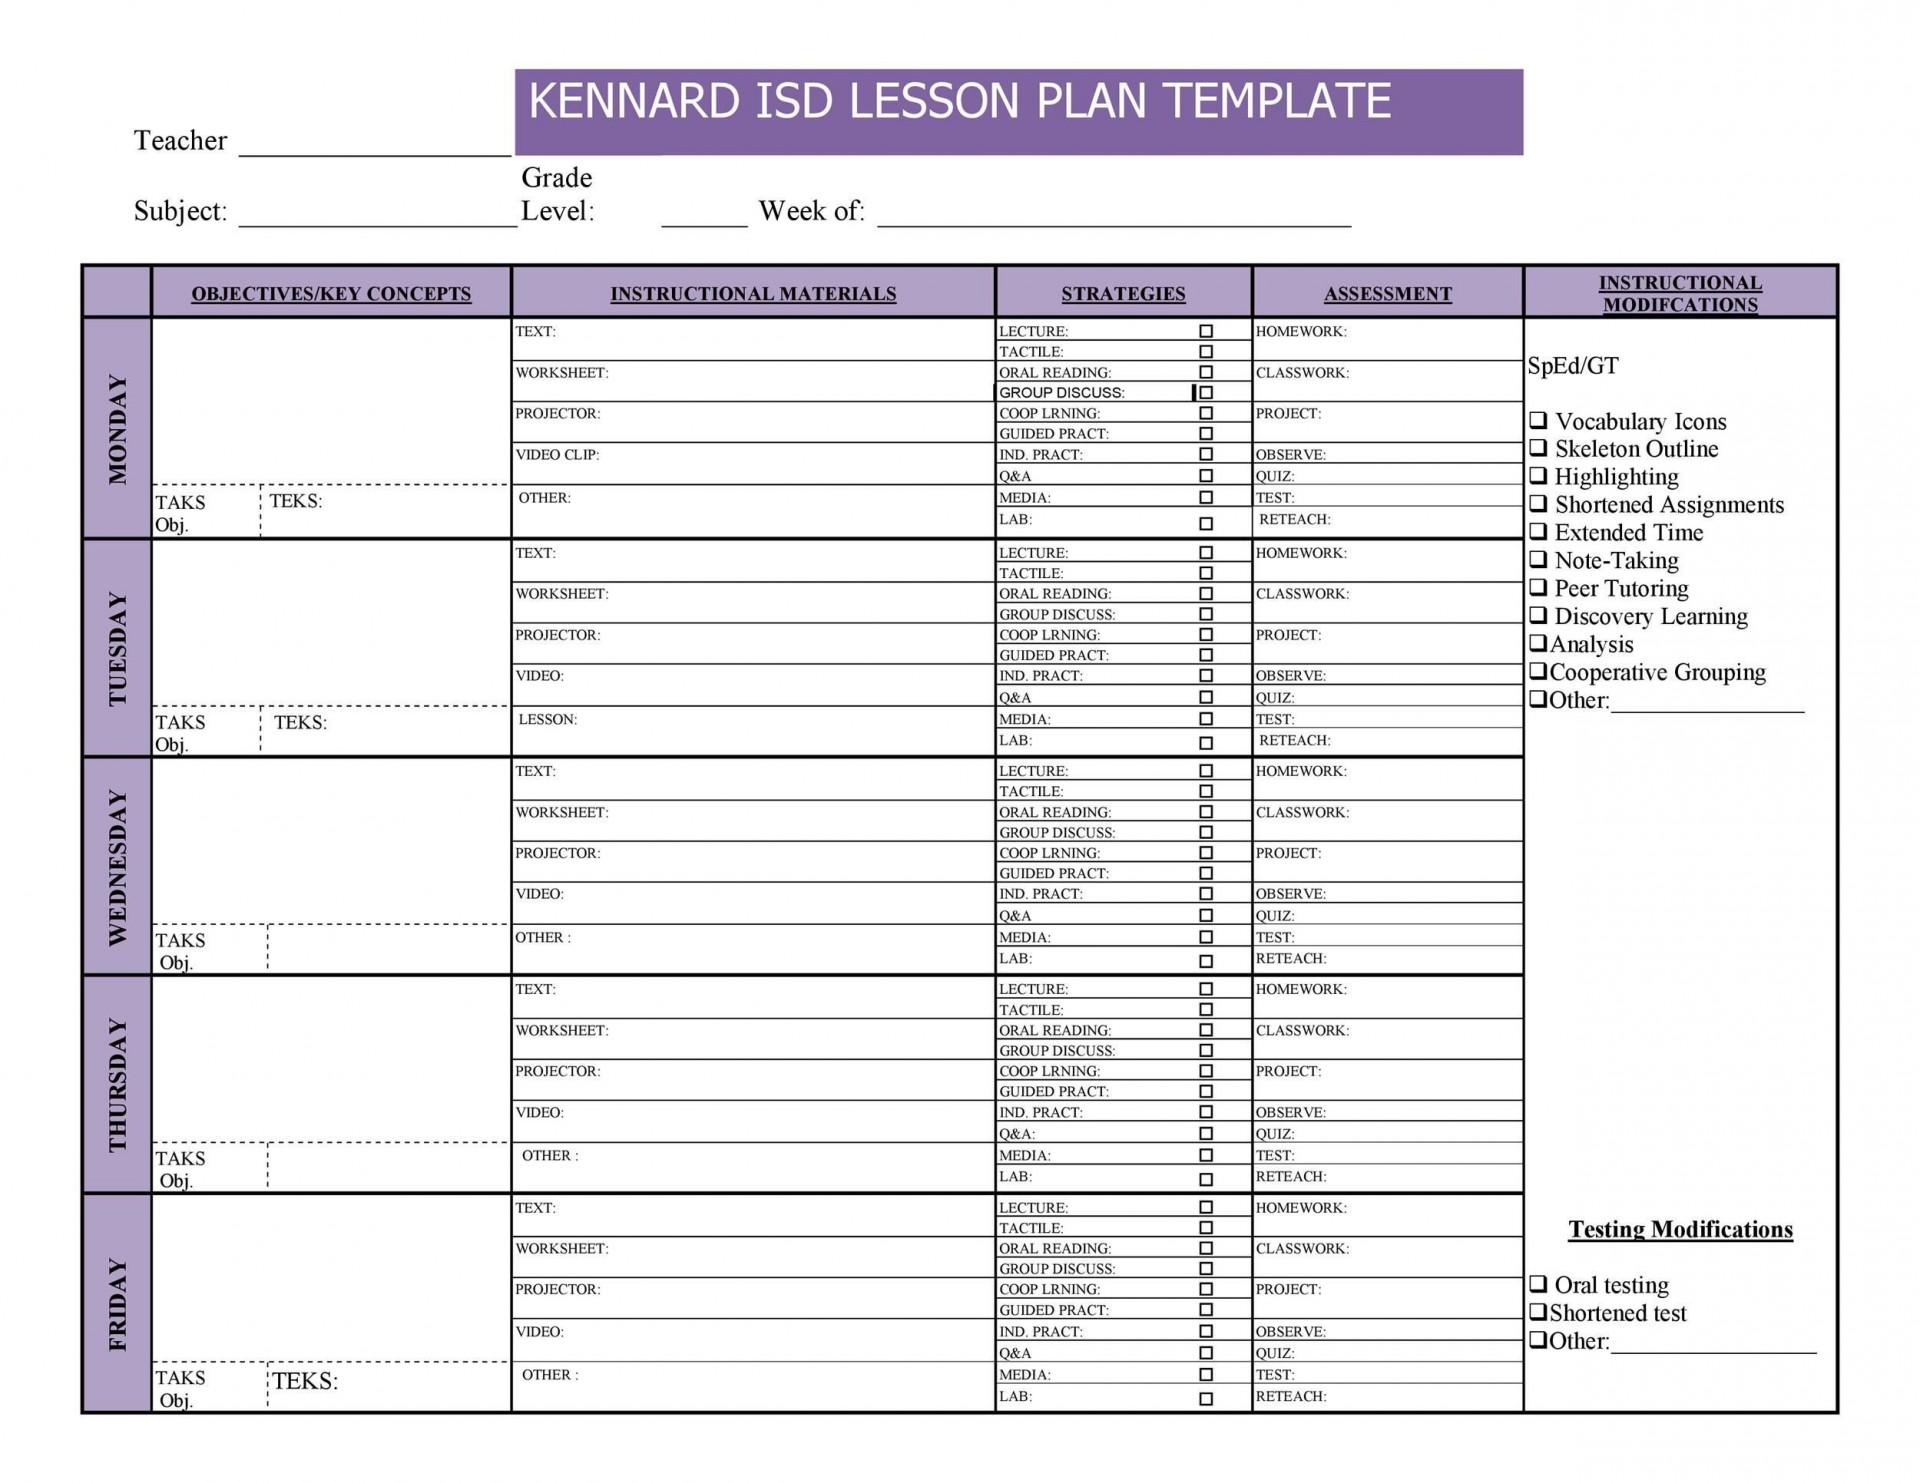 008 Unusual Pre K Lesson Plan Sample Highest Clarity  Nc Template Ga Pre-k1920